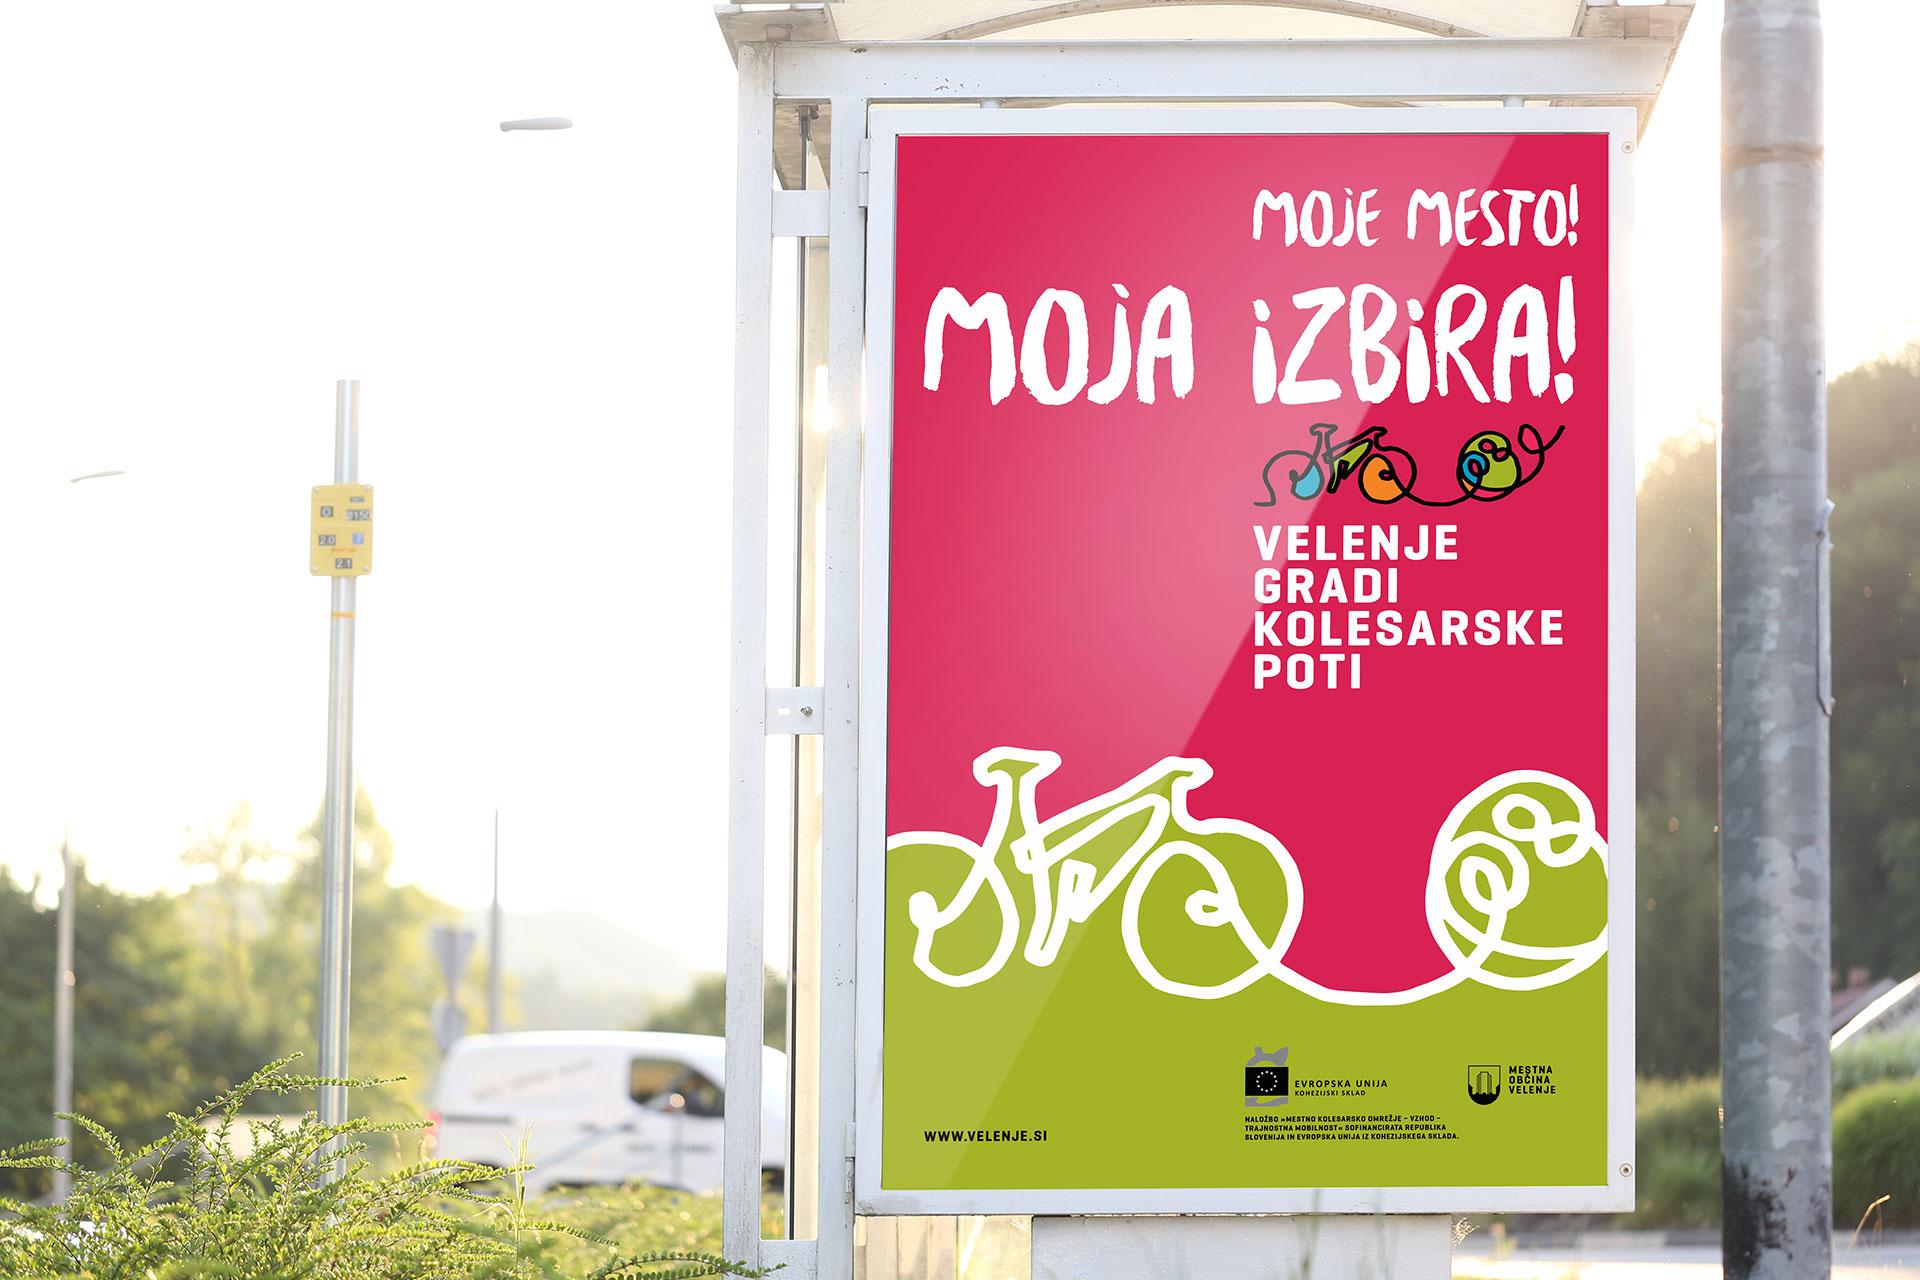 moje_mesto_kolesarske-obcina_velenje-jumbo_vizualna_podoba_marko_marinsek_ma-ma_studio__19_4